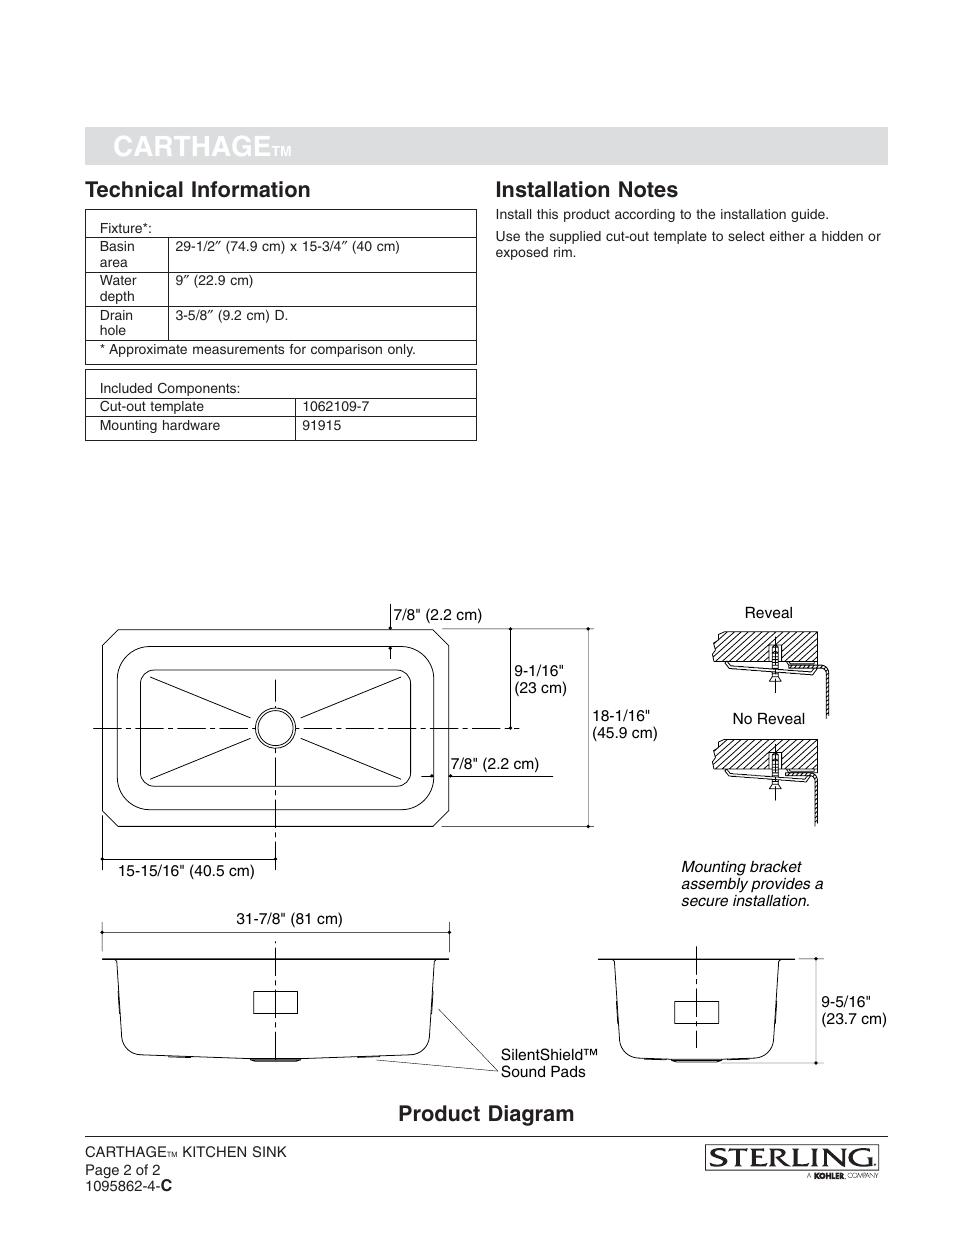 carthage technical information product diagram sterling plumbing rh manualsdir com Gerber Plumbing Sterling Plumbing Shower Doors